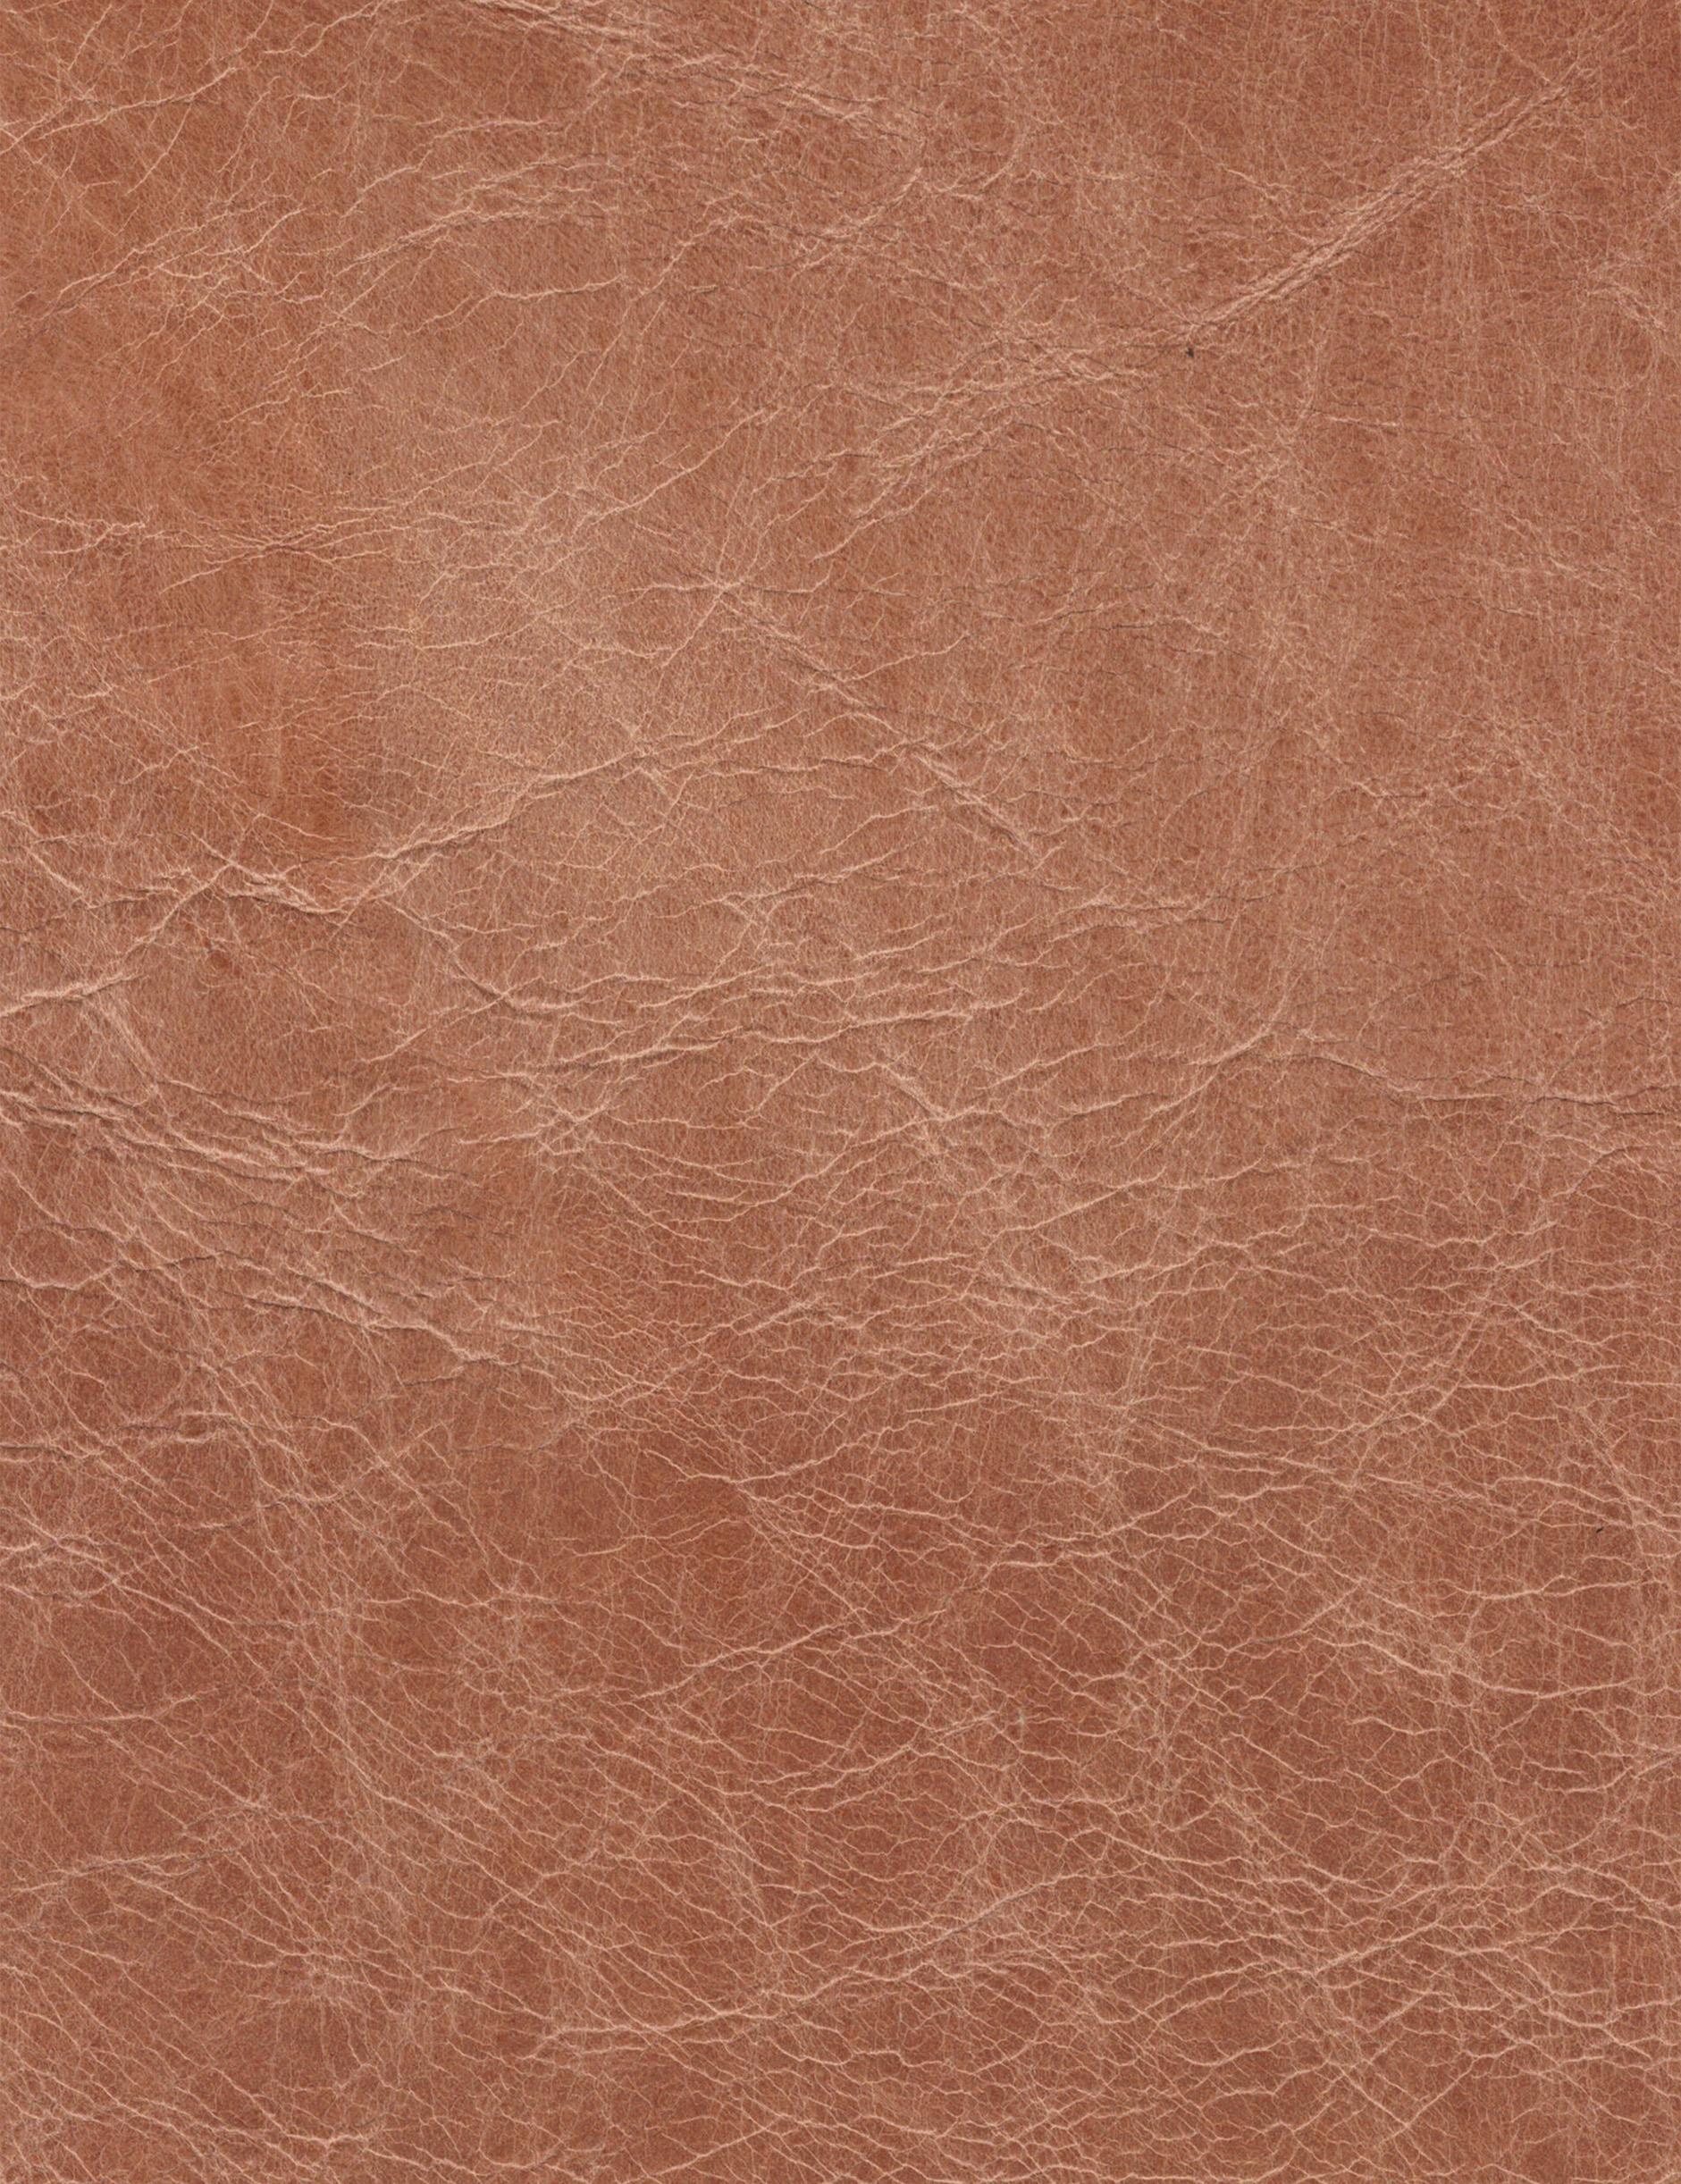 Oak Frame - Natural Tanned Leather